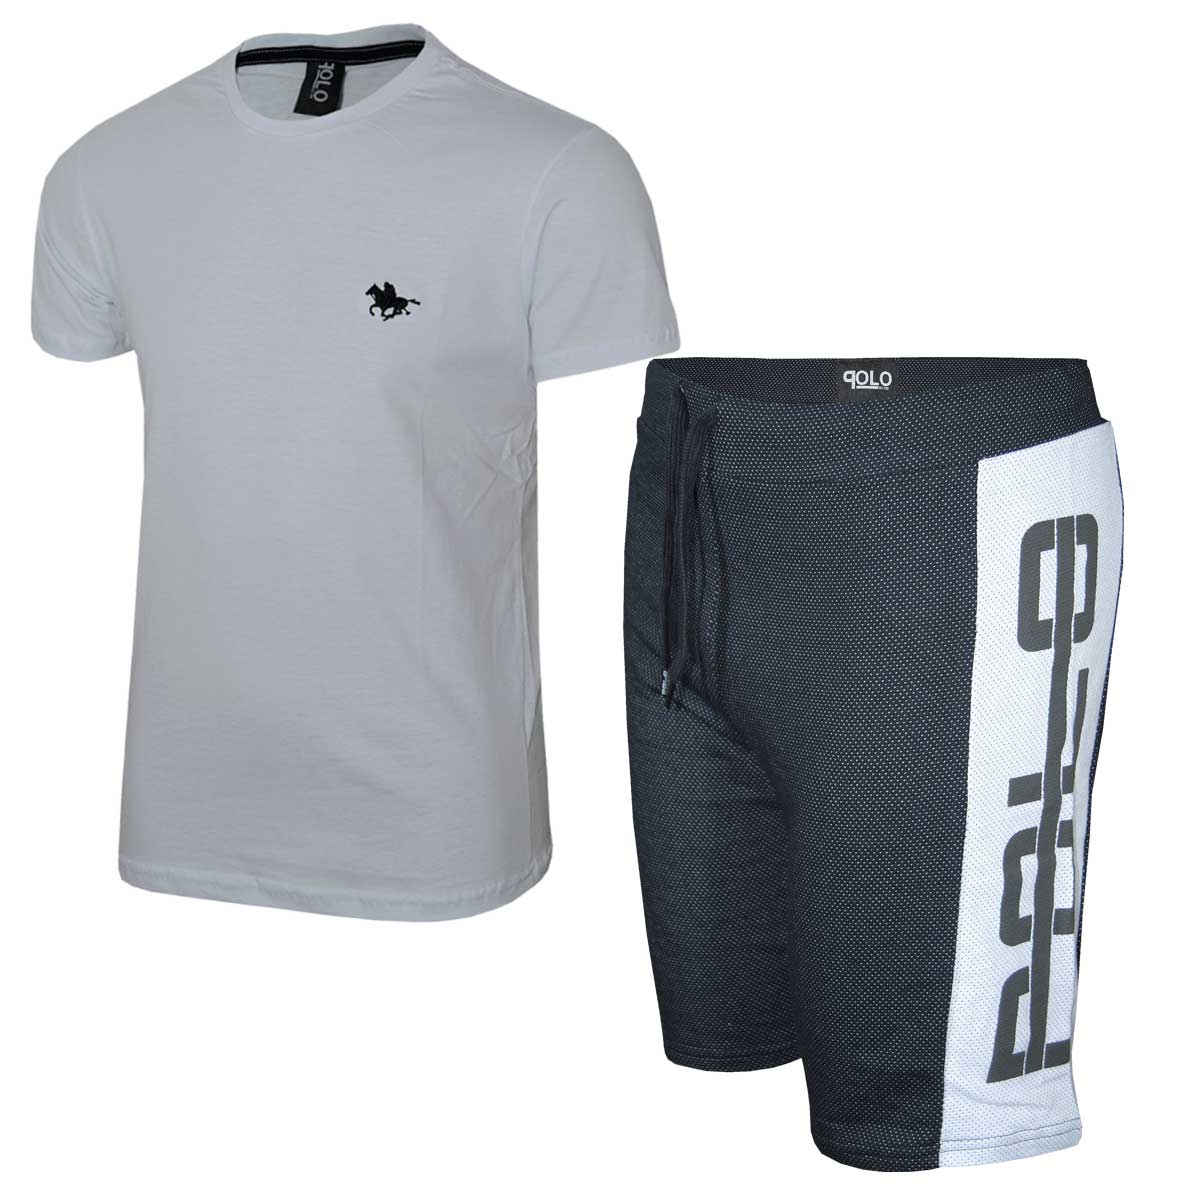 Kit Camiseta Branca e Bermuda Preta Polo RG518